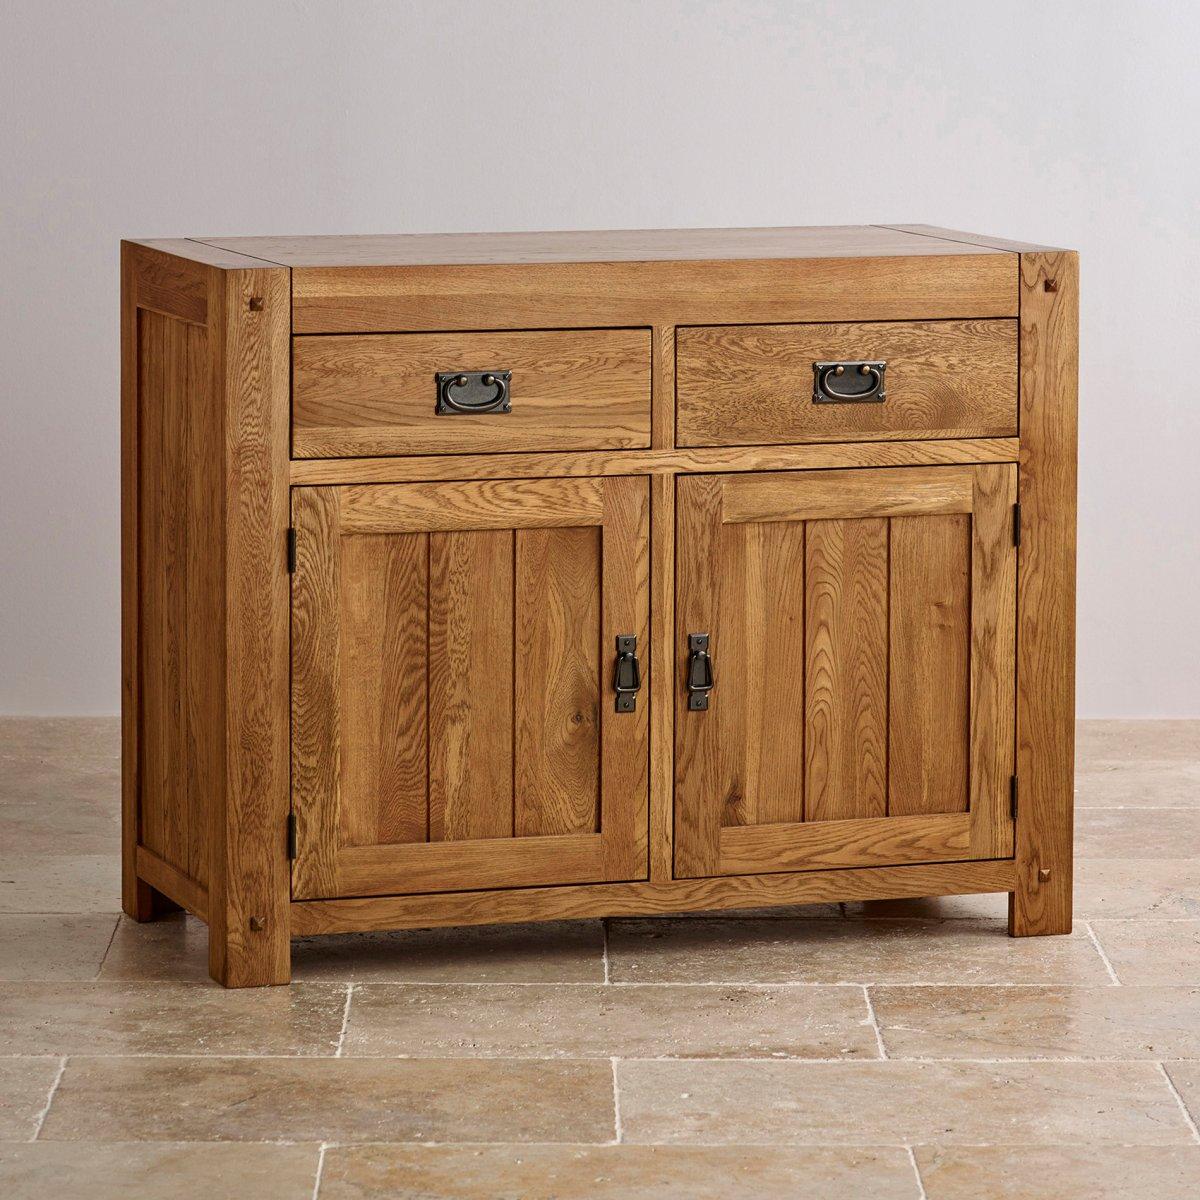 quercus small sideboard in rustic oak oak furniture land. Black Bedroom Furniture Sets. Home Design Ideas